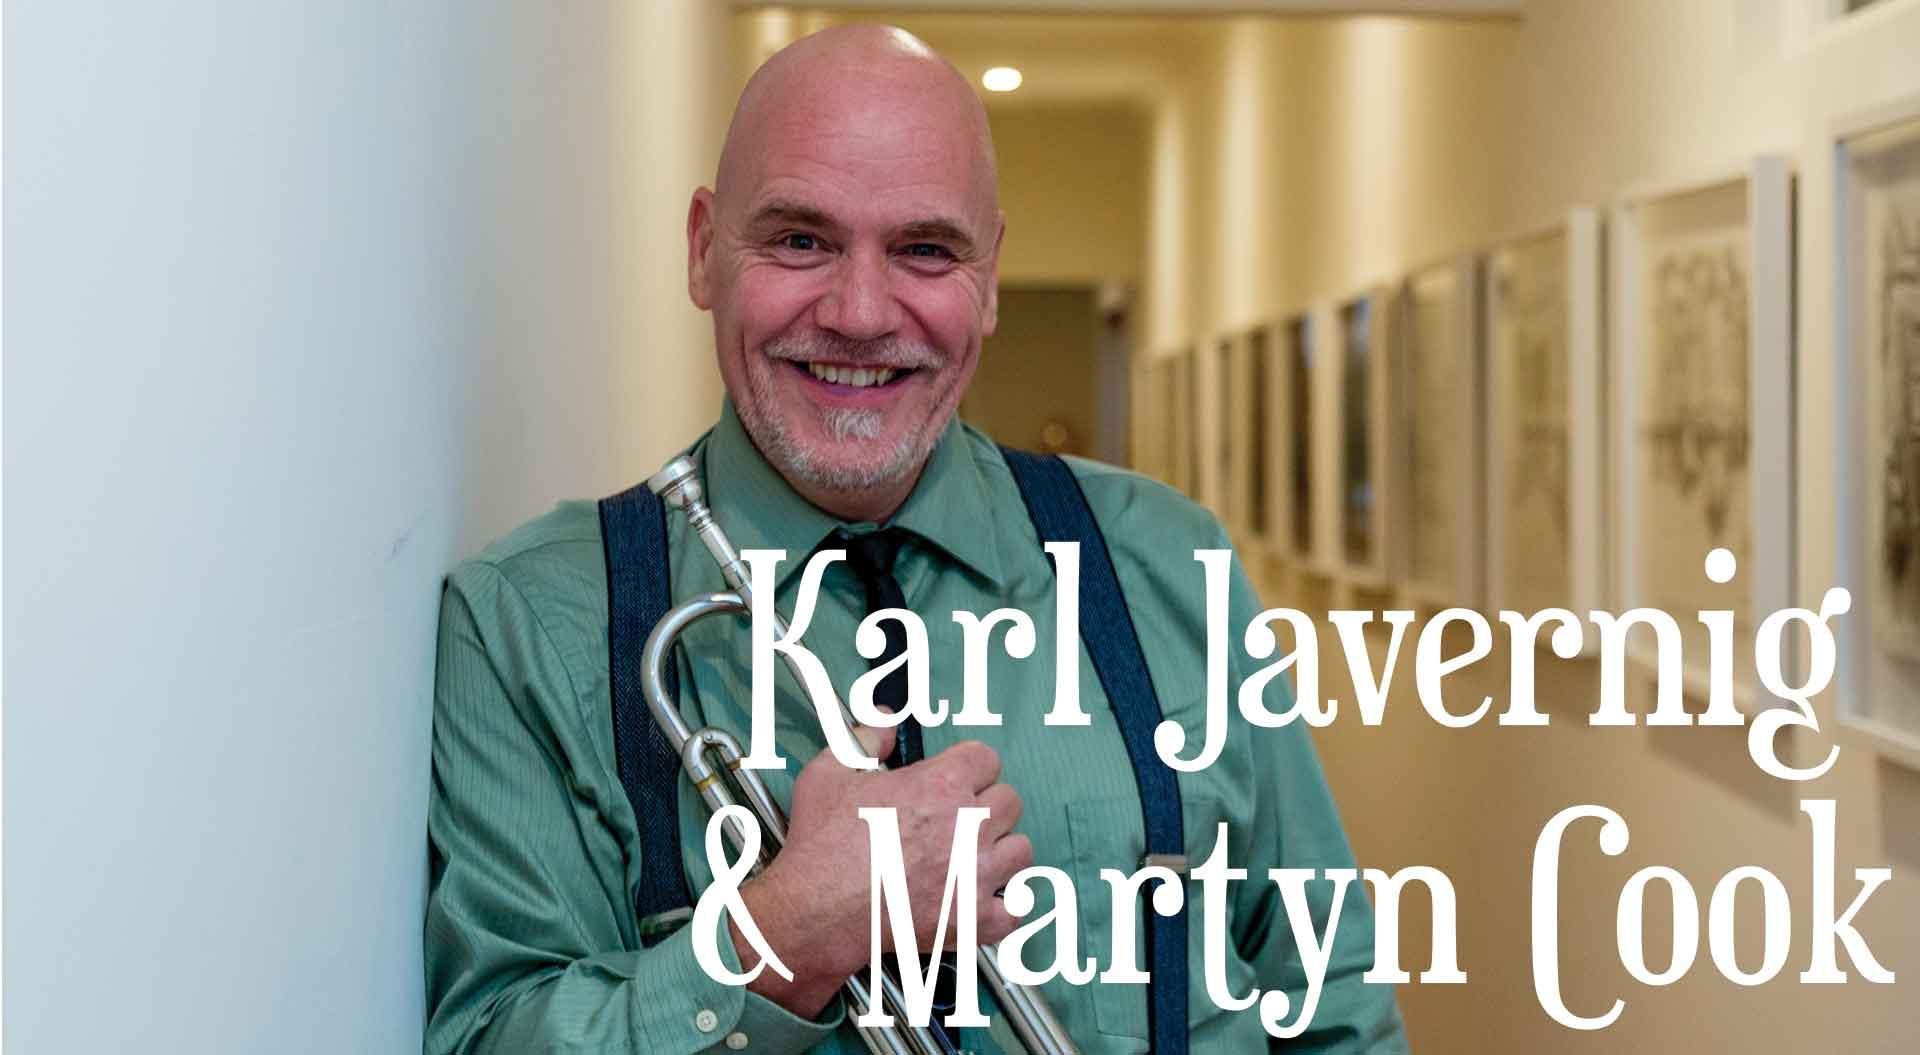 Karl Javernig & Martyn Cook | Nombre 230 | Palais Royale Hotel